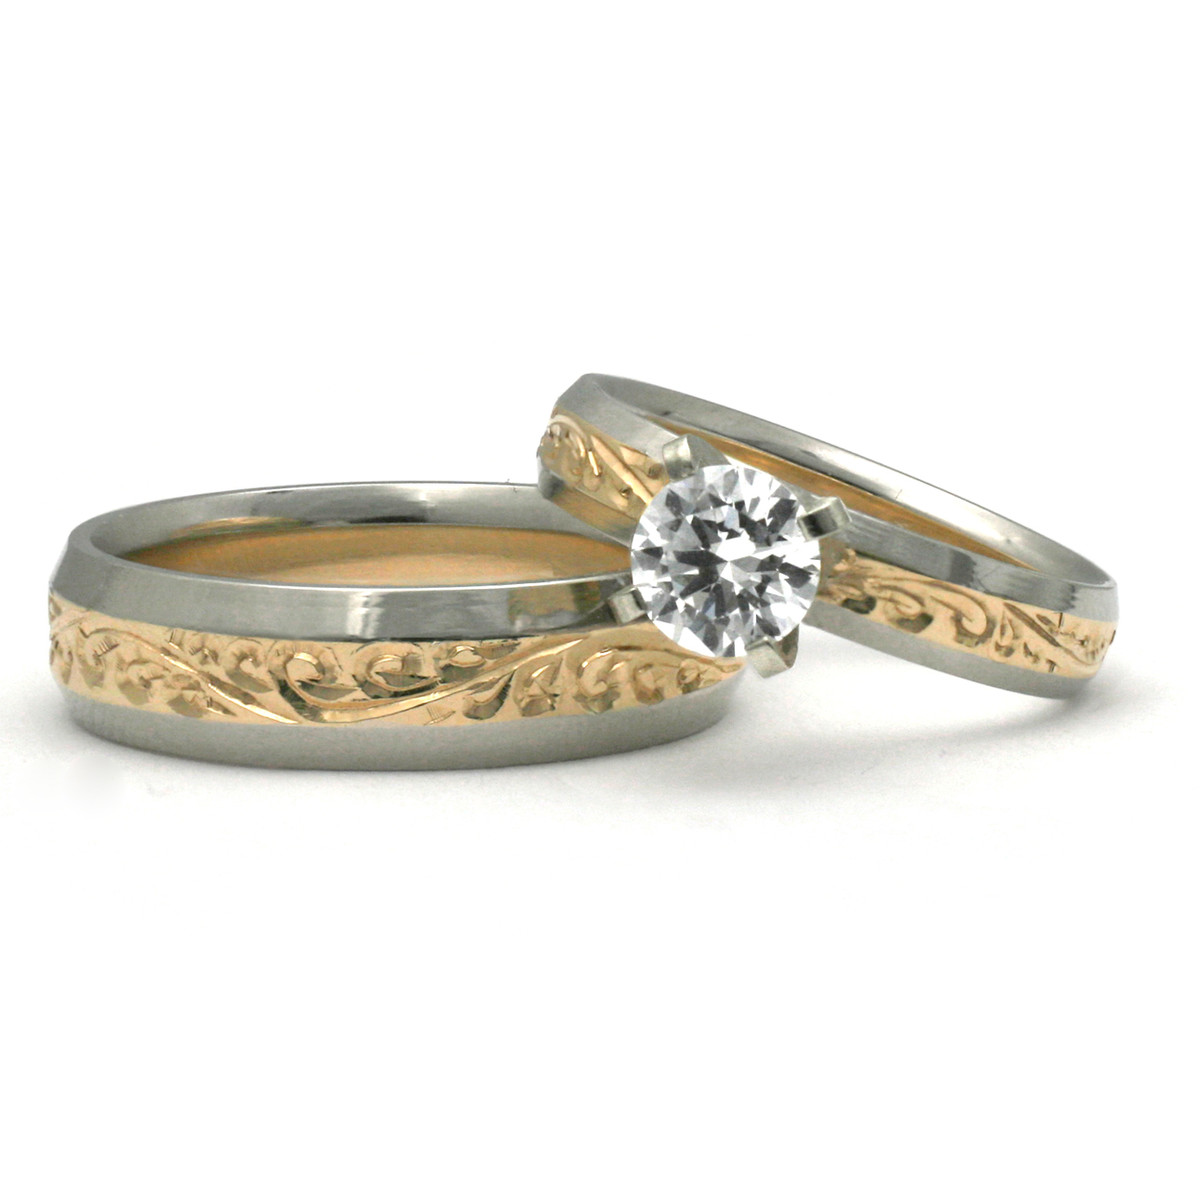 Honolulu jewelry company jewelry honolulu hi for Jewelry wedding rings